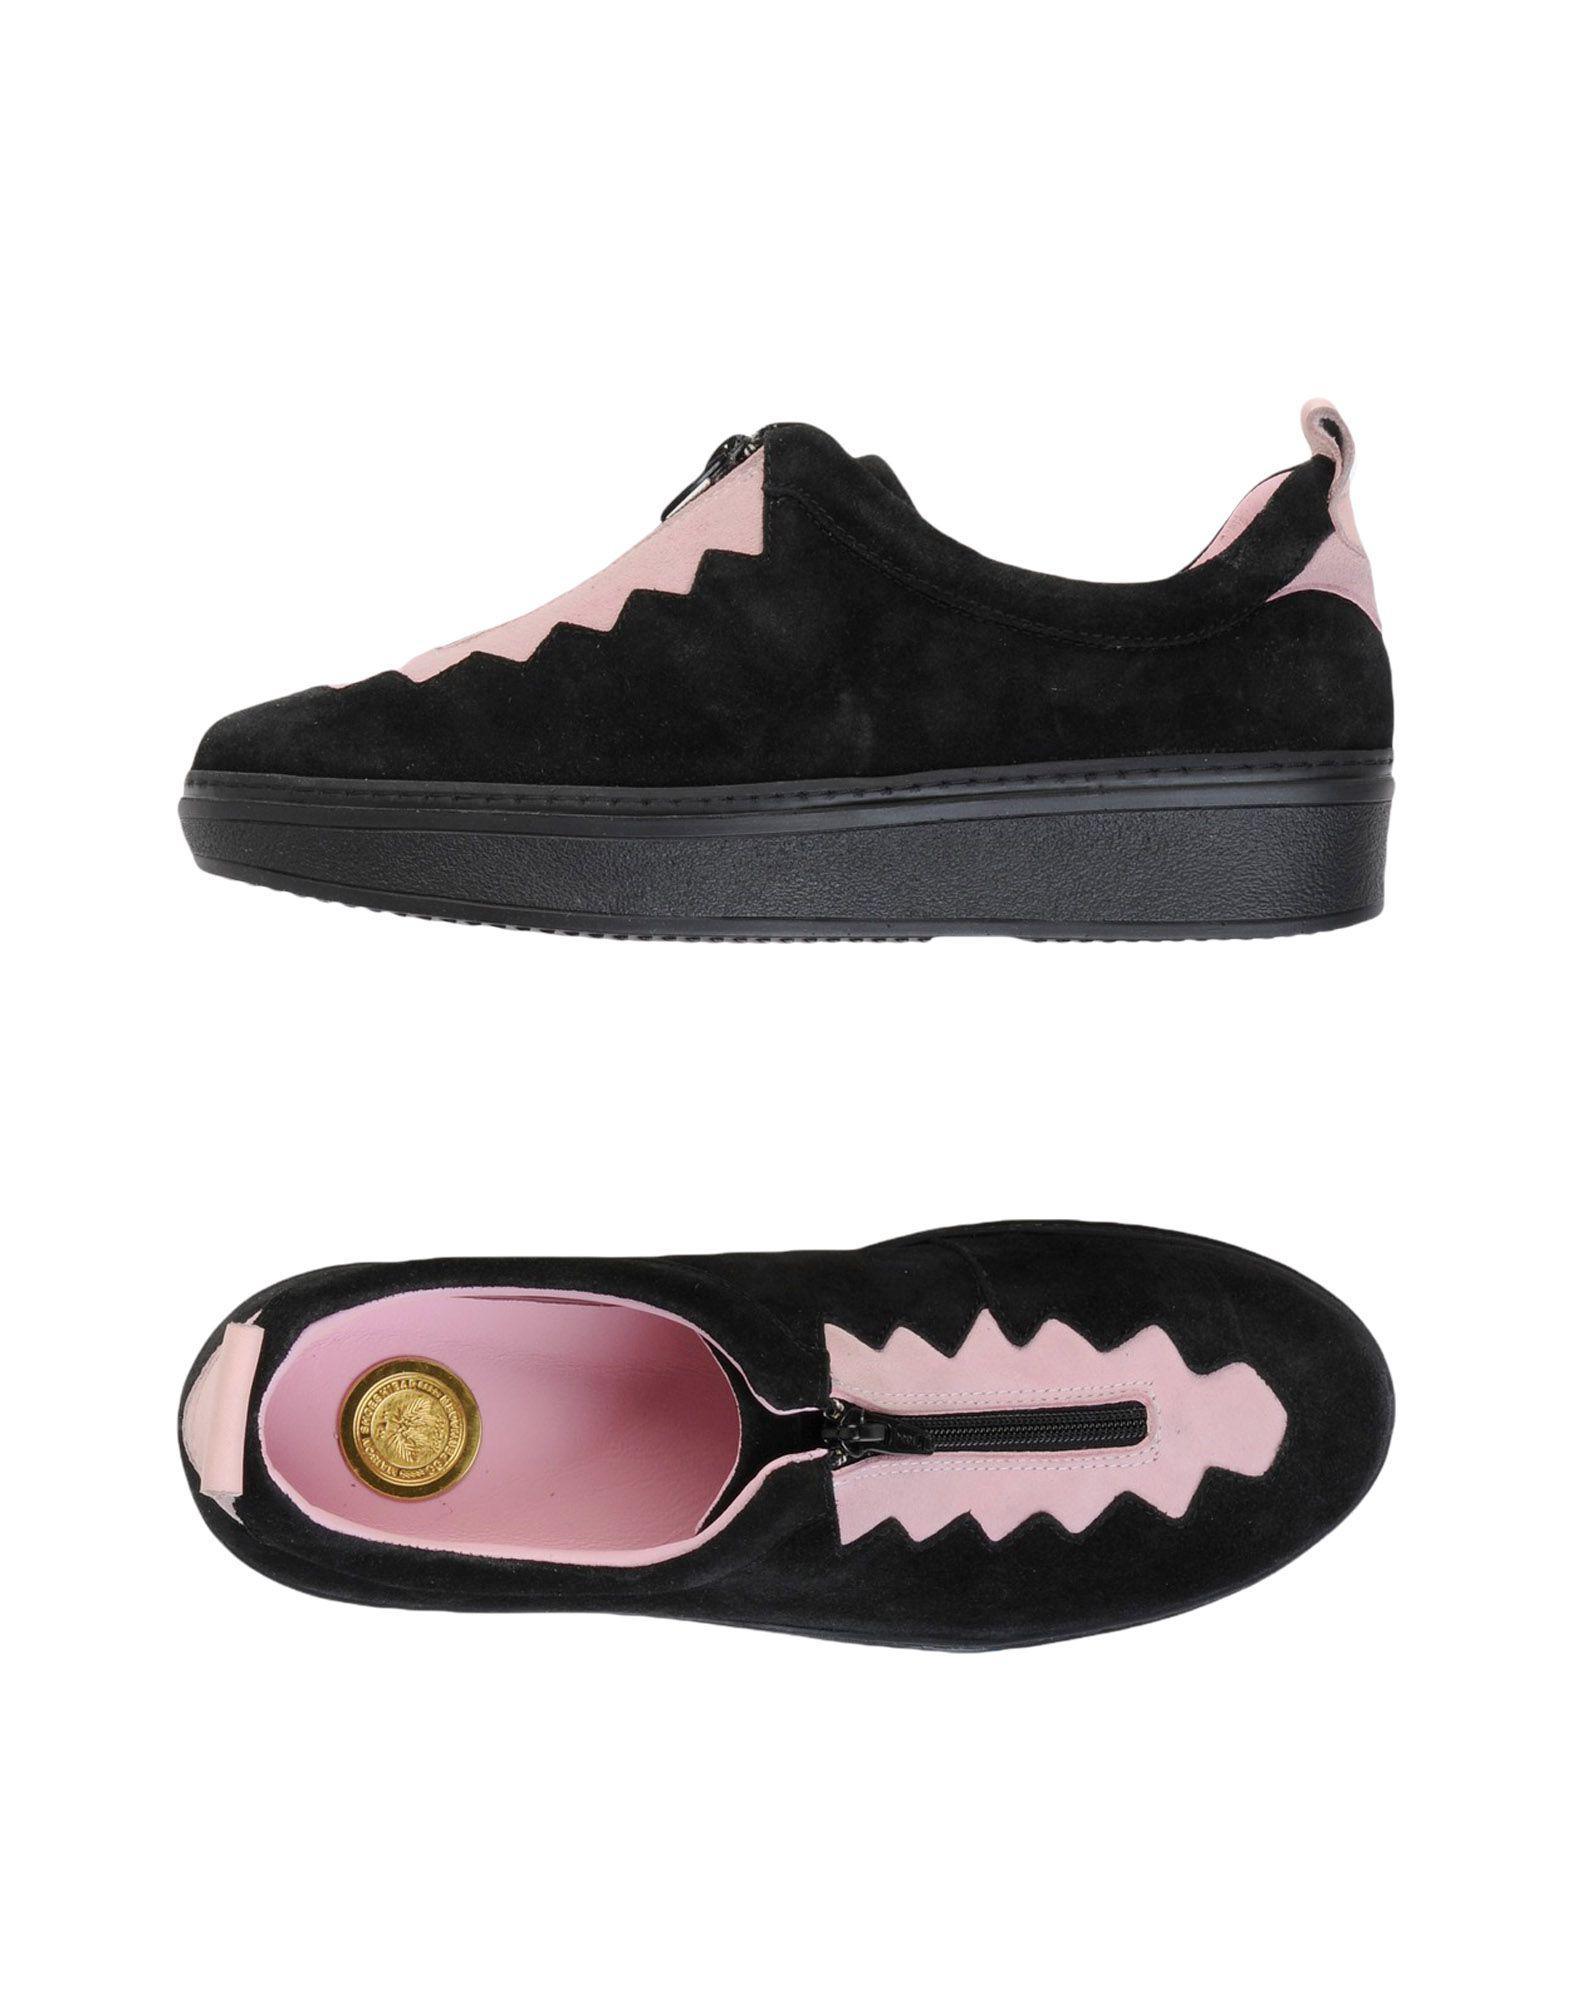 Chaussures - Bas-tops Et Baskets Soi-reine oSw39hHLq